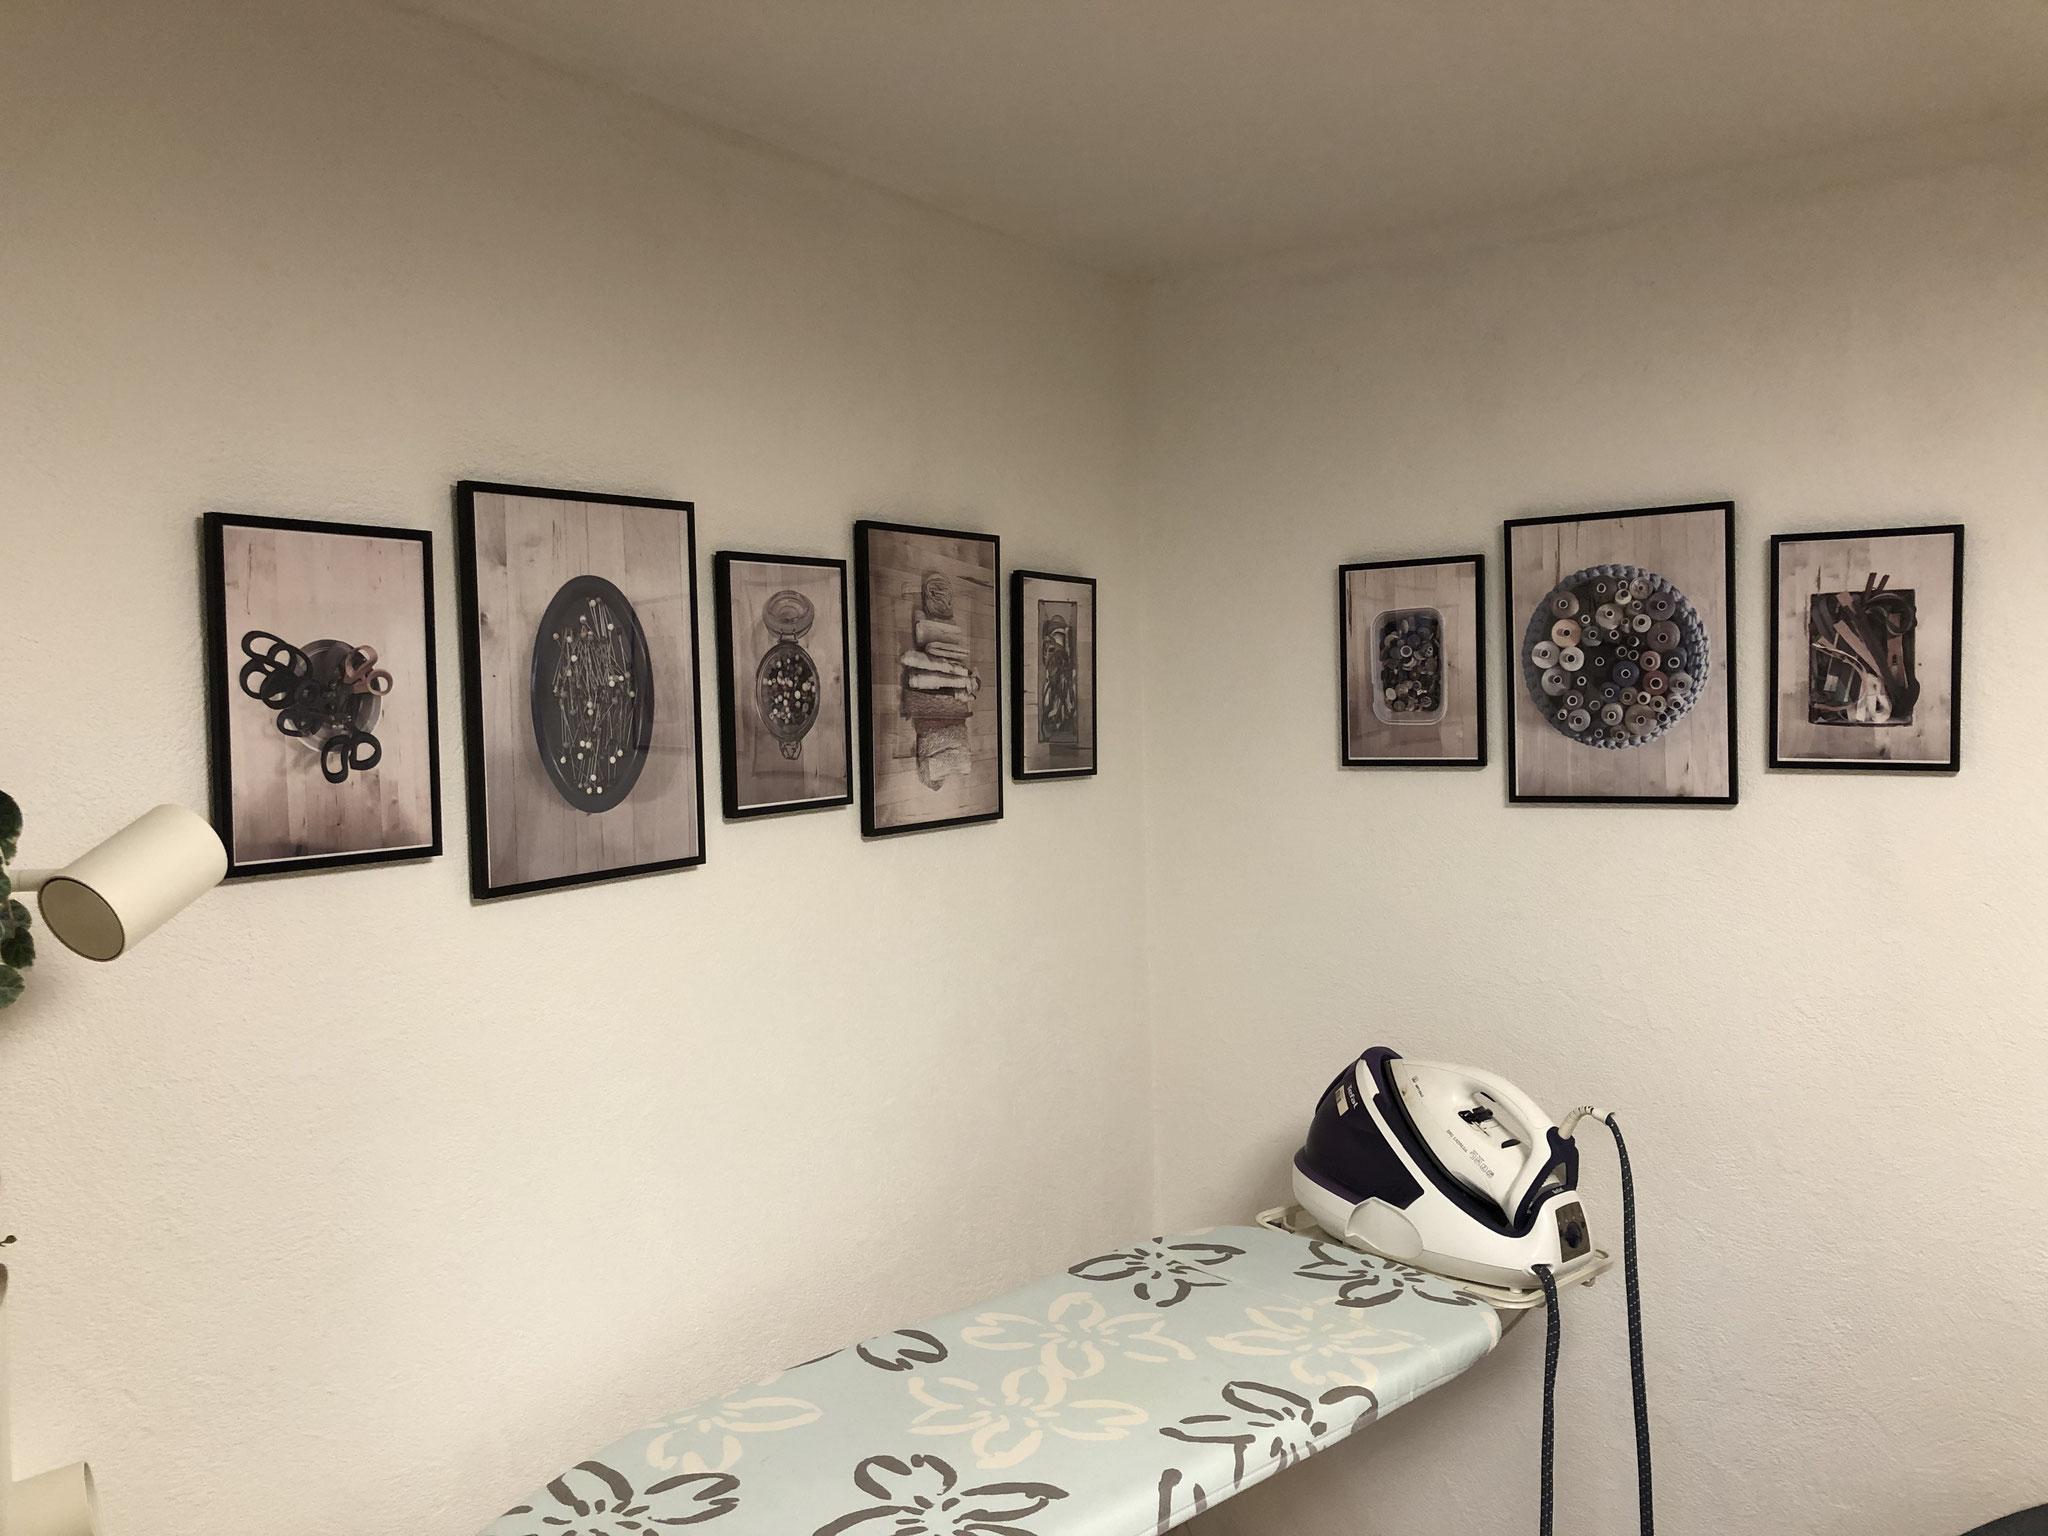 Meine eigene Fotogalerie